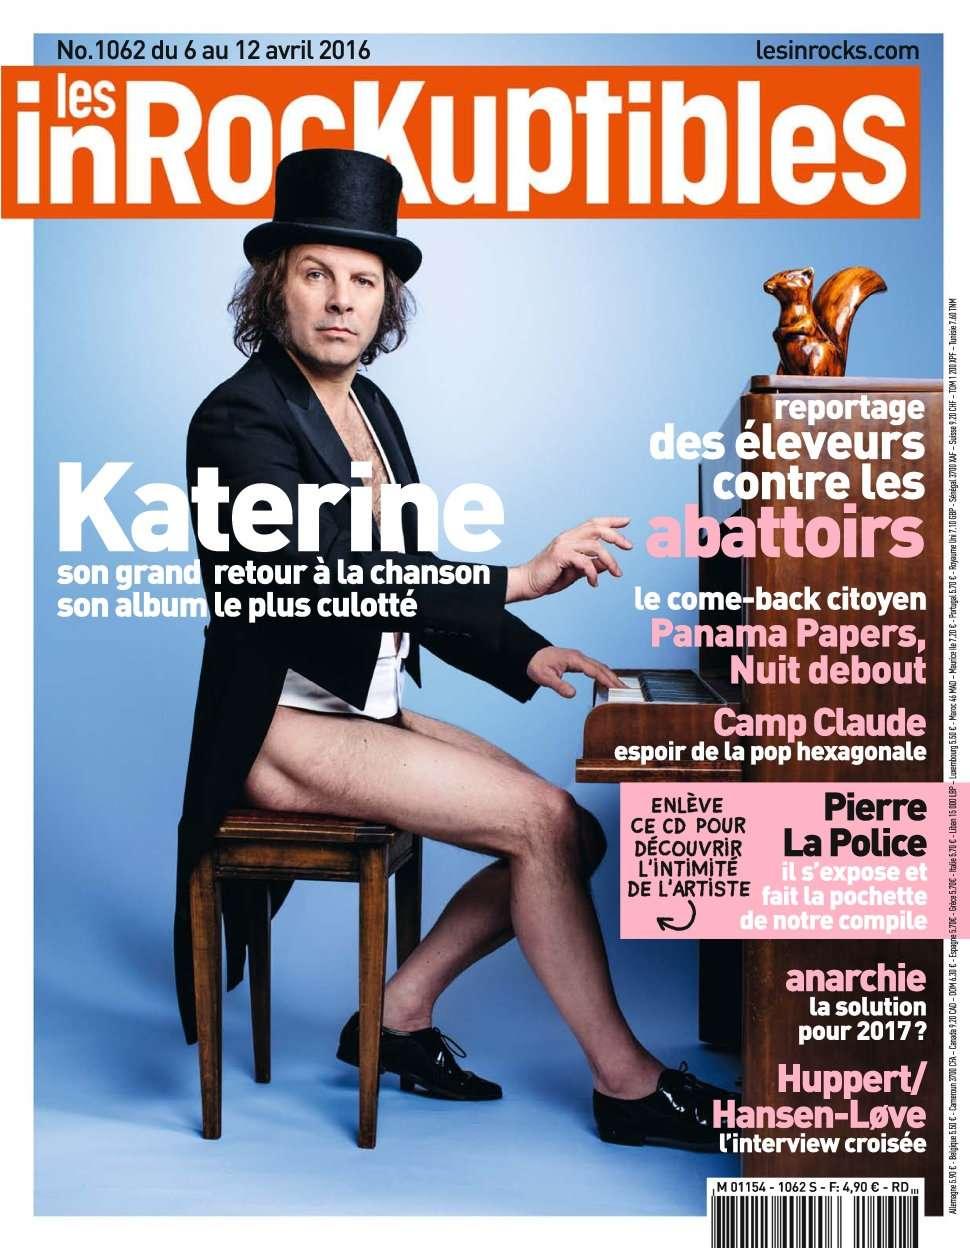 Les Inrockuptibles 1062 - 6 au 12 Avril 2016